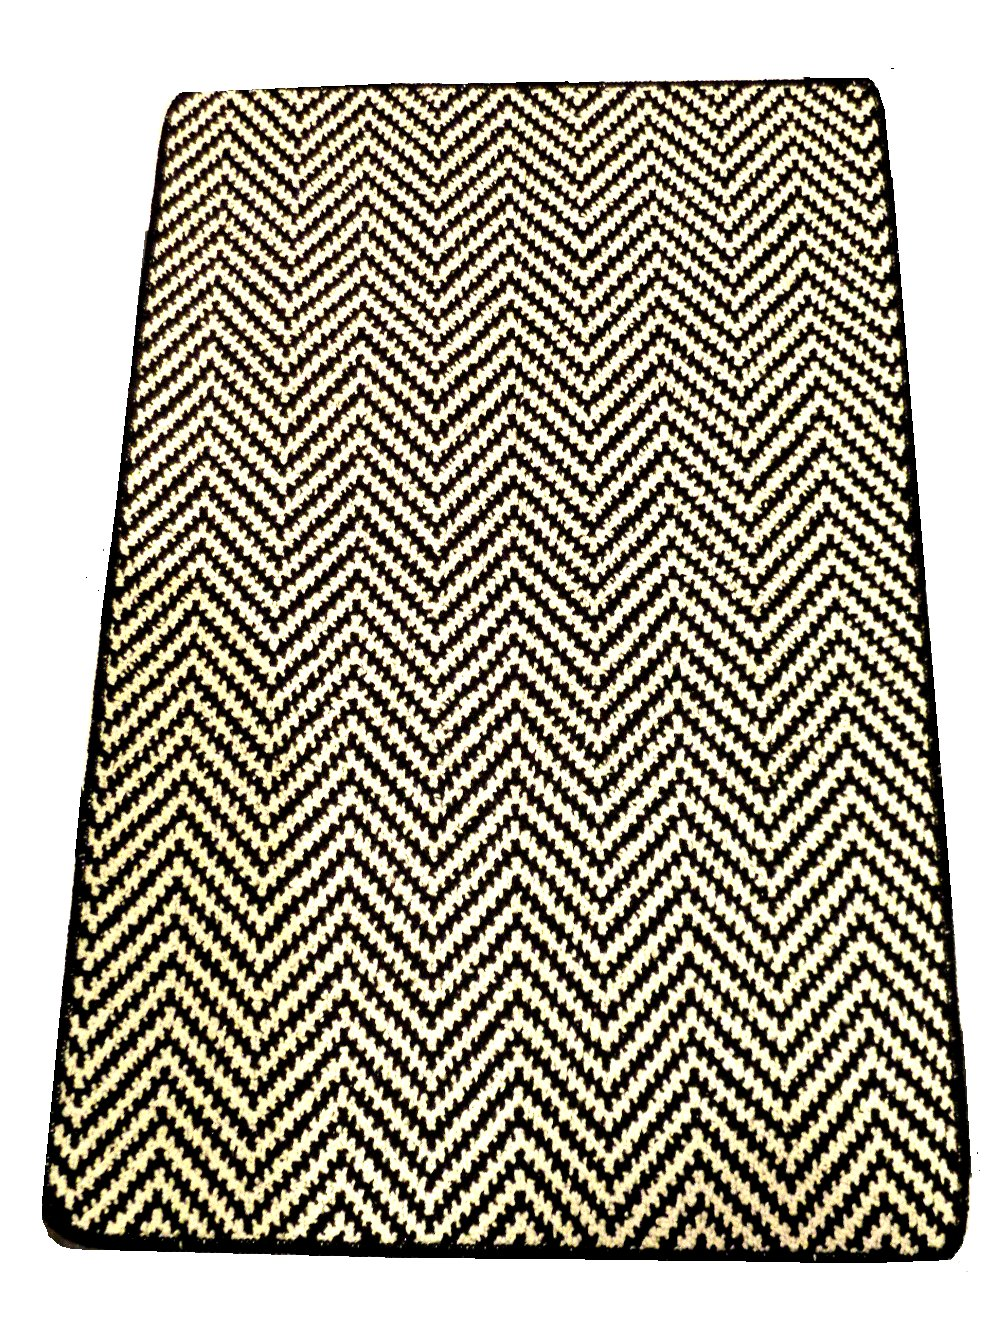 White Black Chevron Broadloom Rug Mat